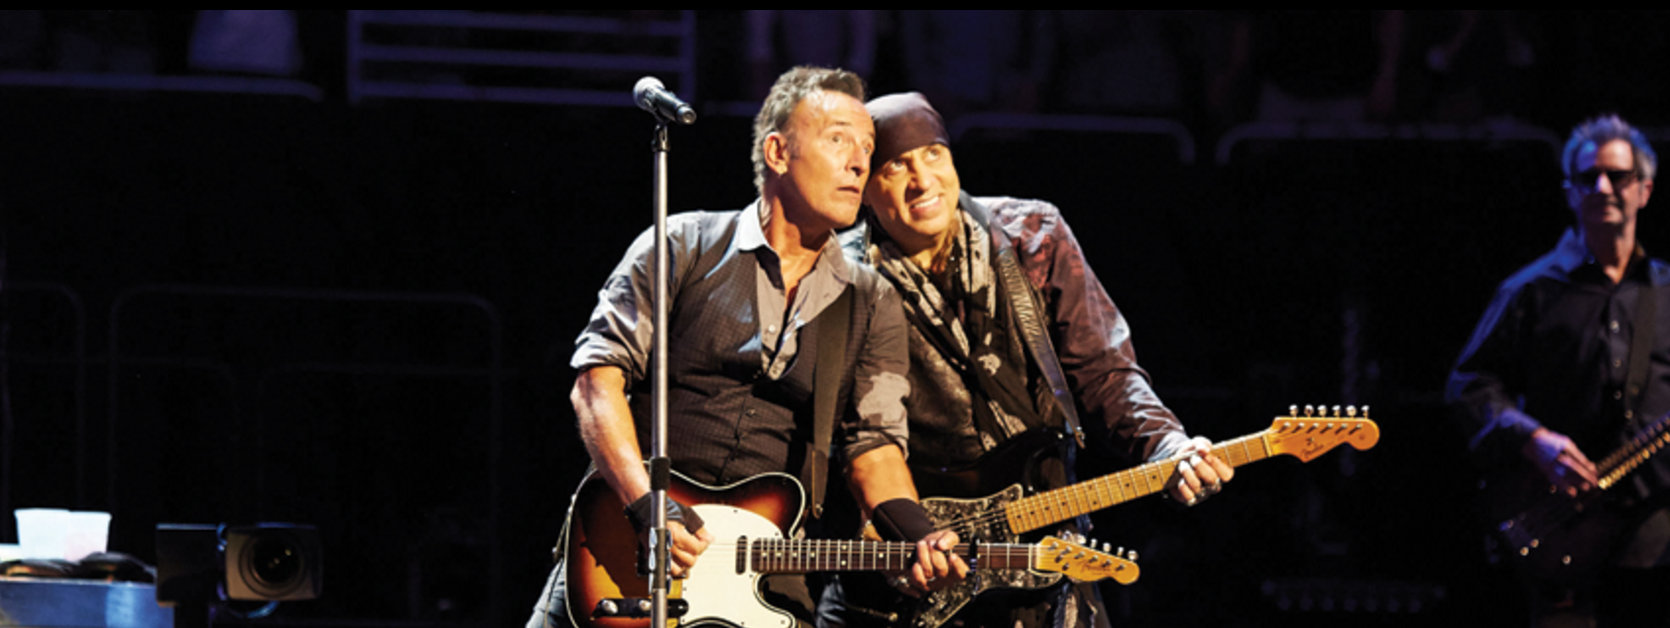 Persfoto Bruce Springsteen